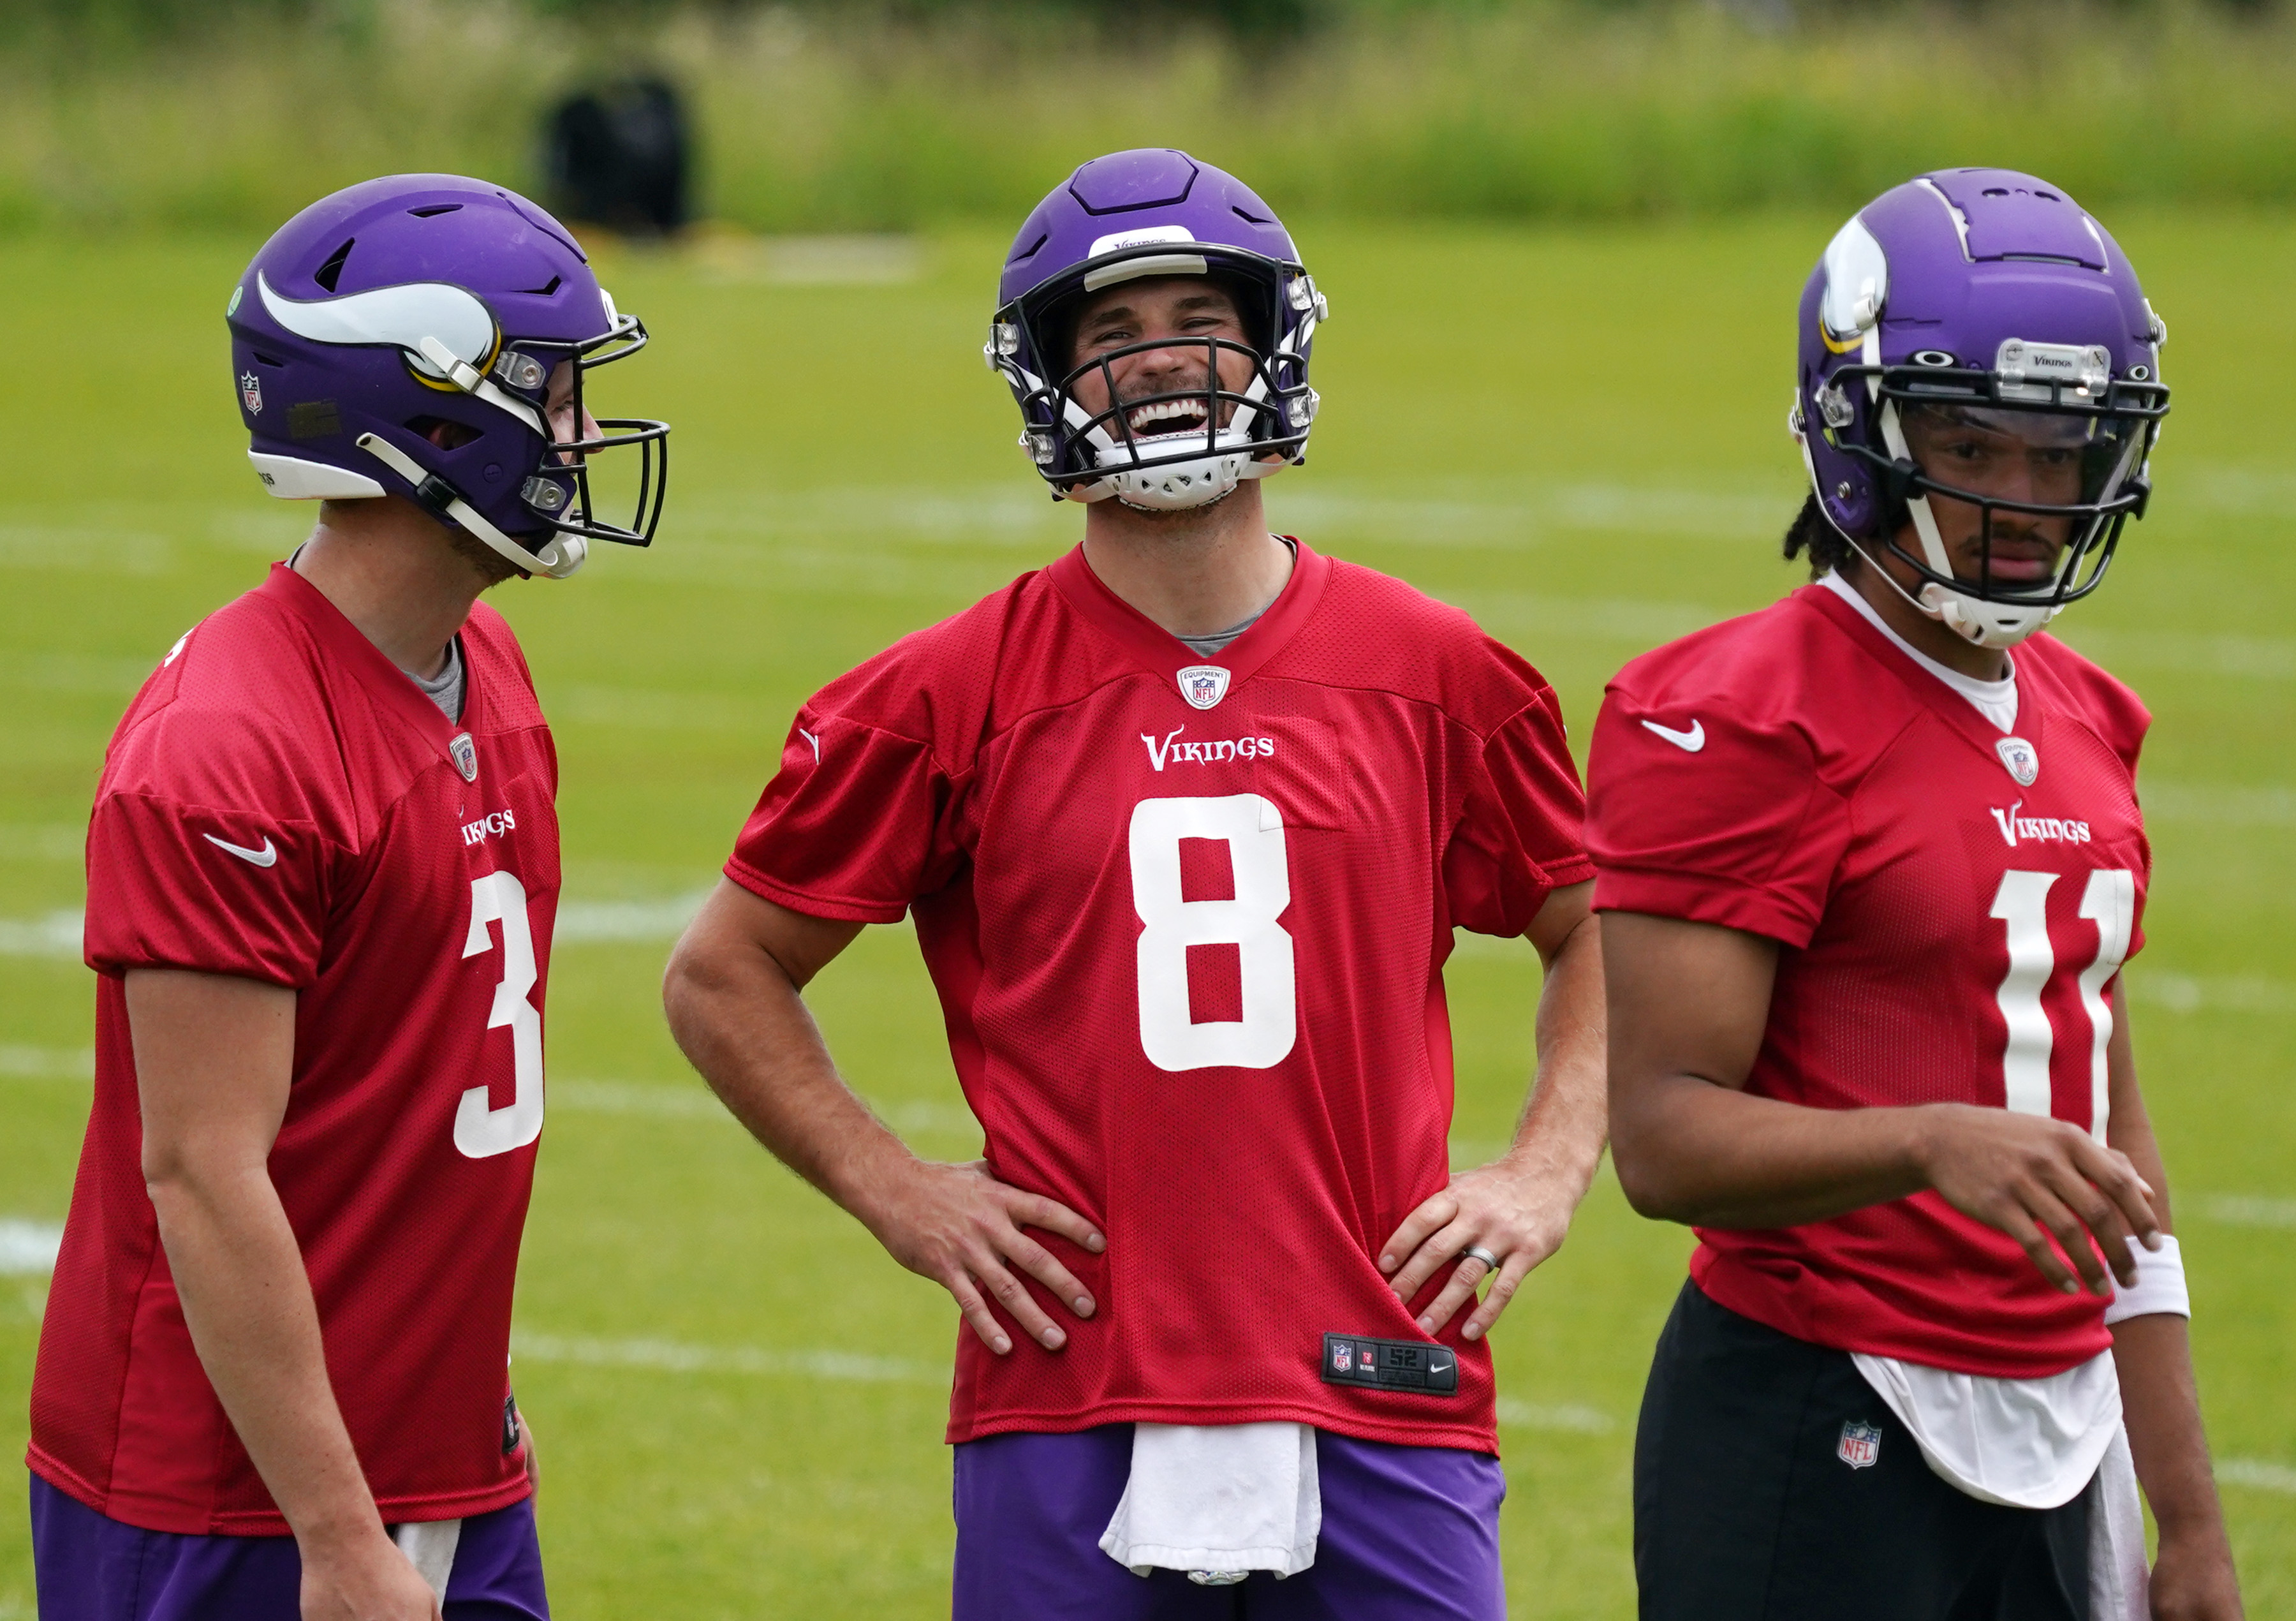 Kirk Cousins (8) with his fellow quarterbacks Jake Browning (3) and Kellen Mond (11) last week.